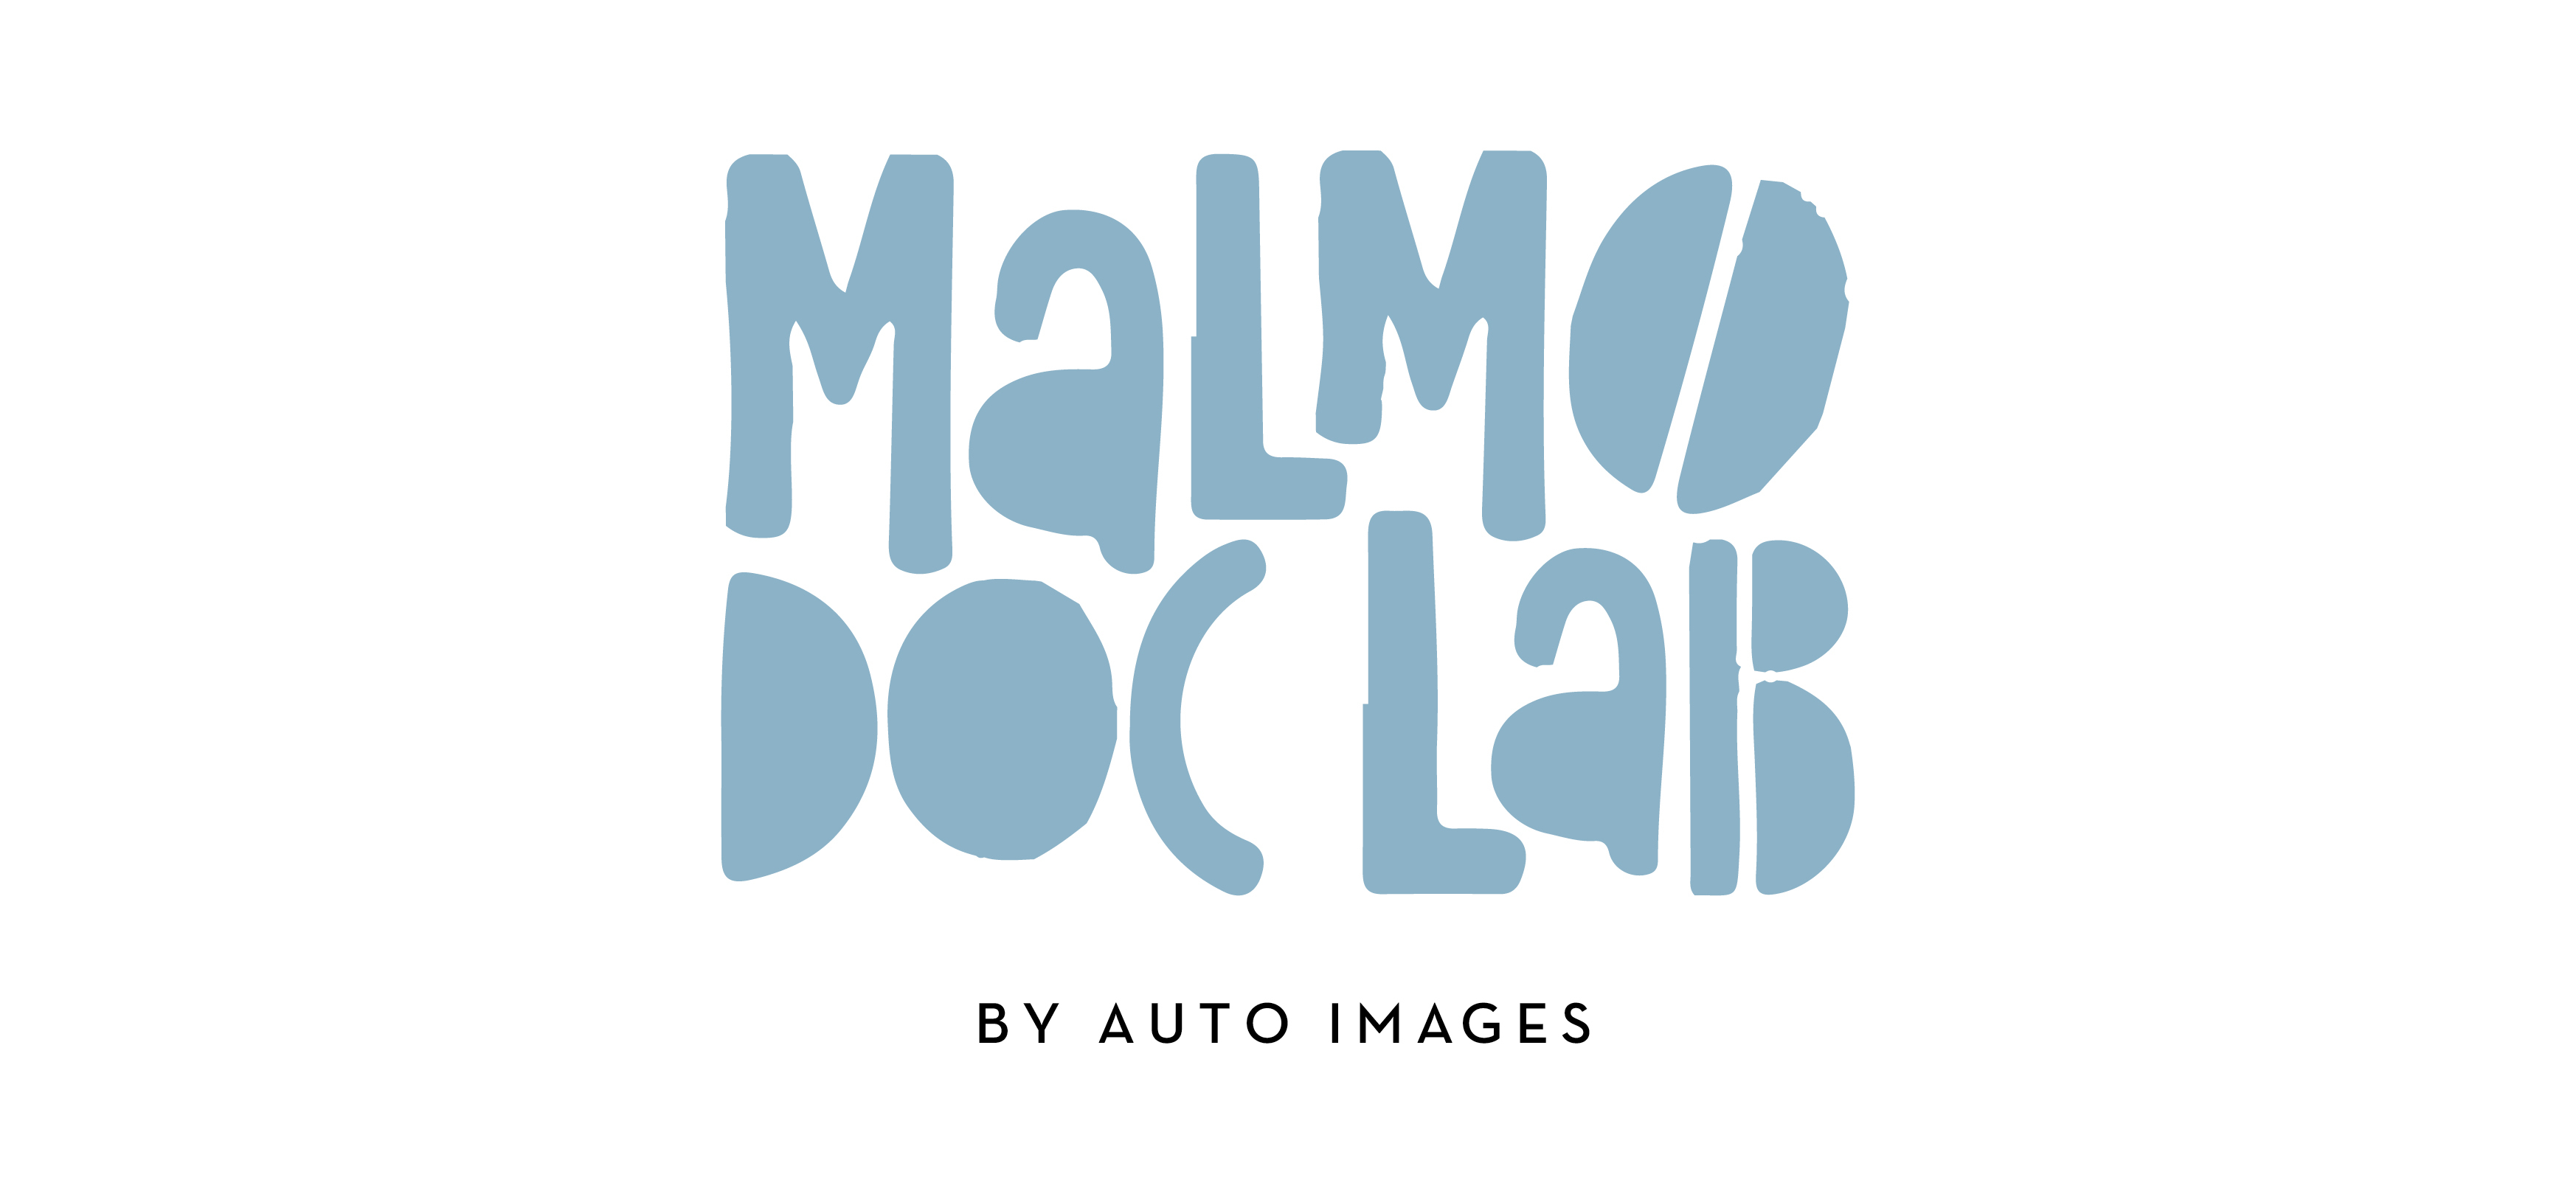 MalmoDocLabWideBlue.jpg